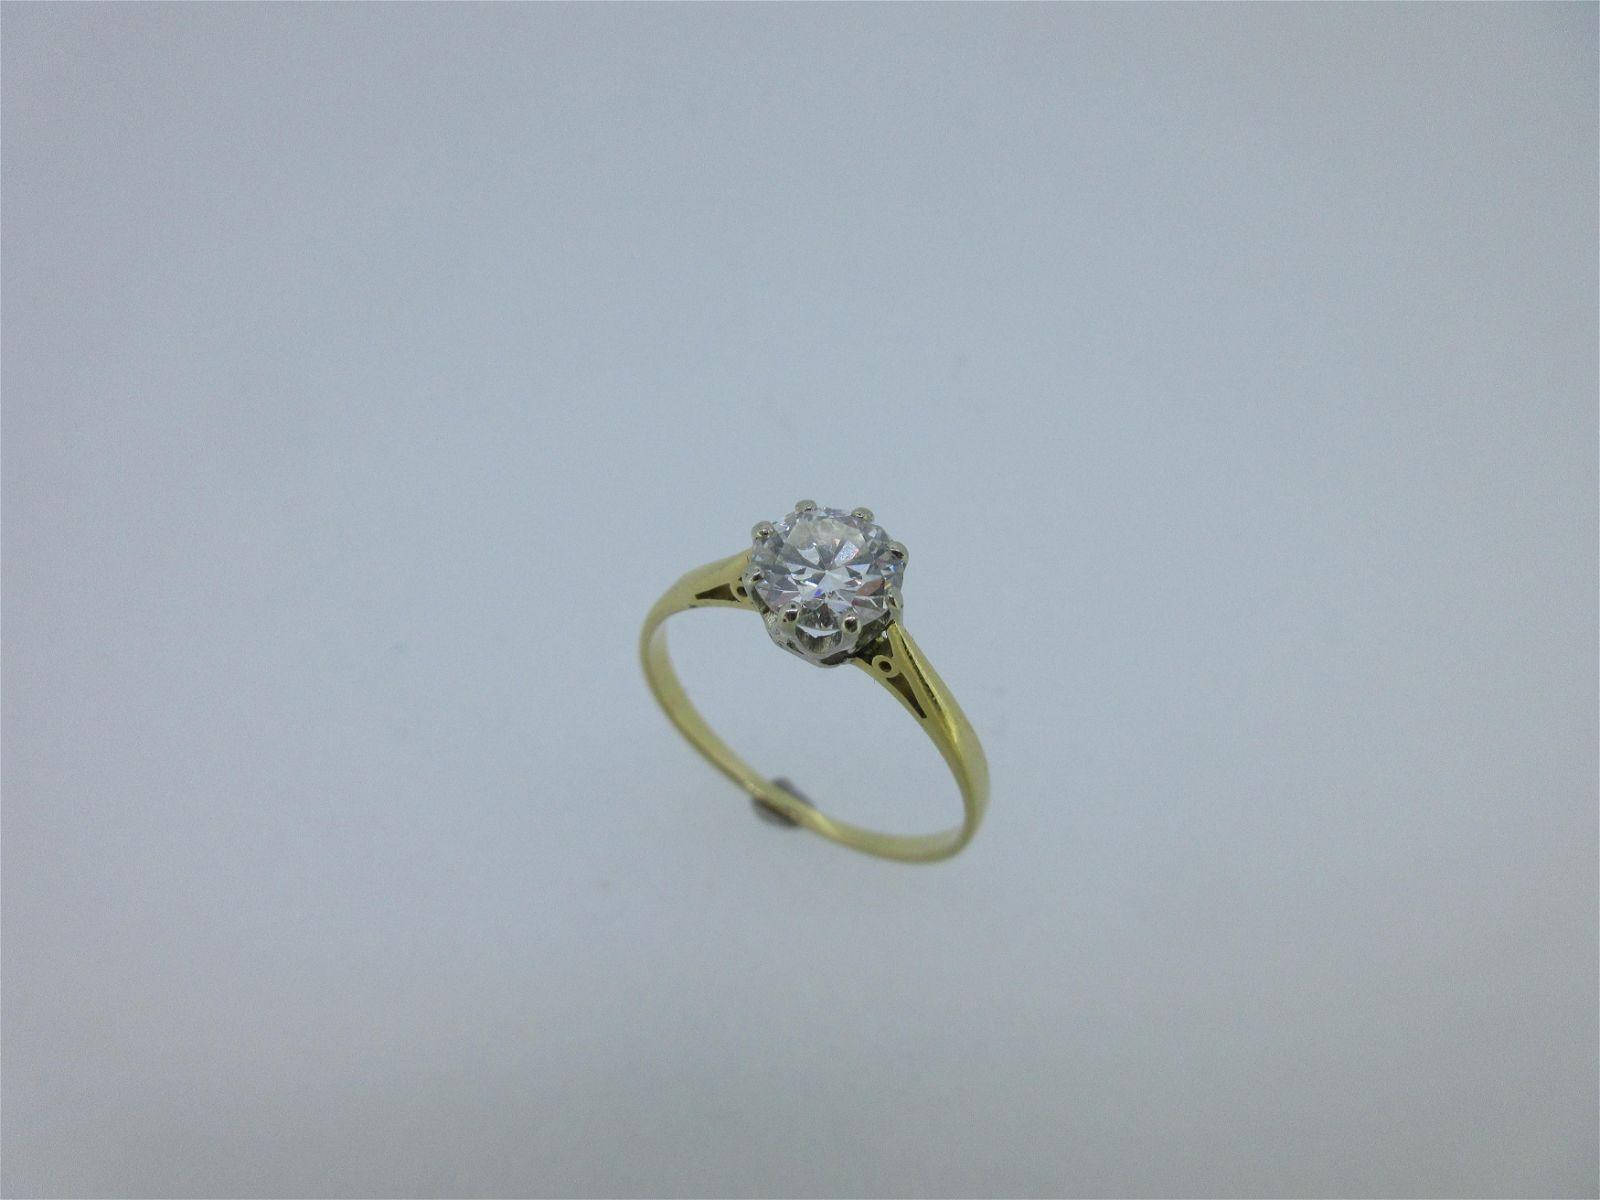 A single stone diamond ring,